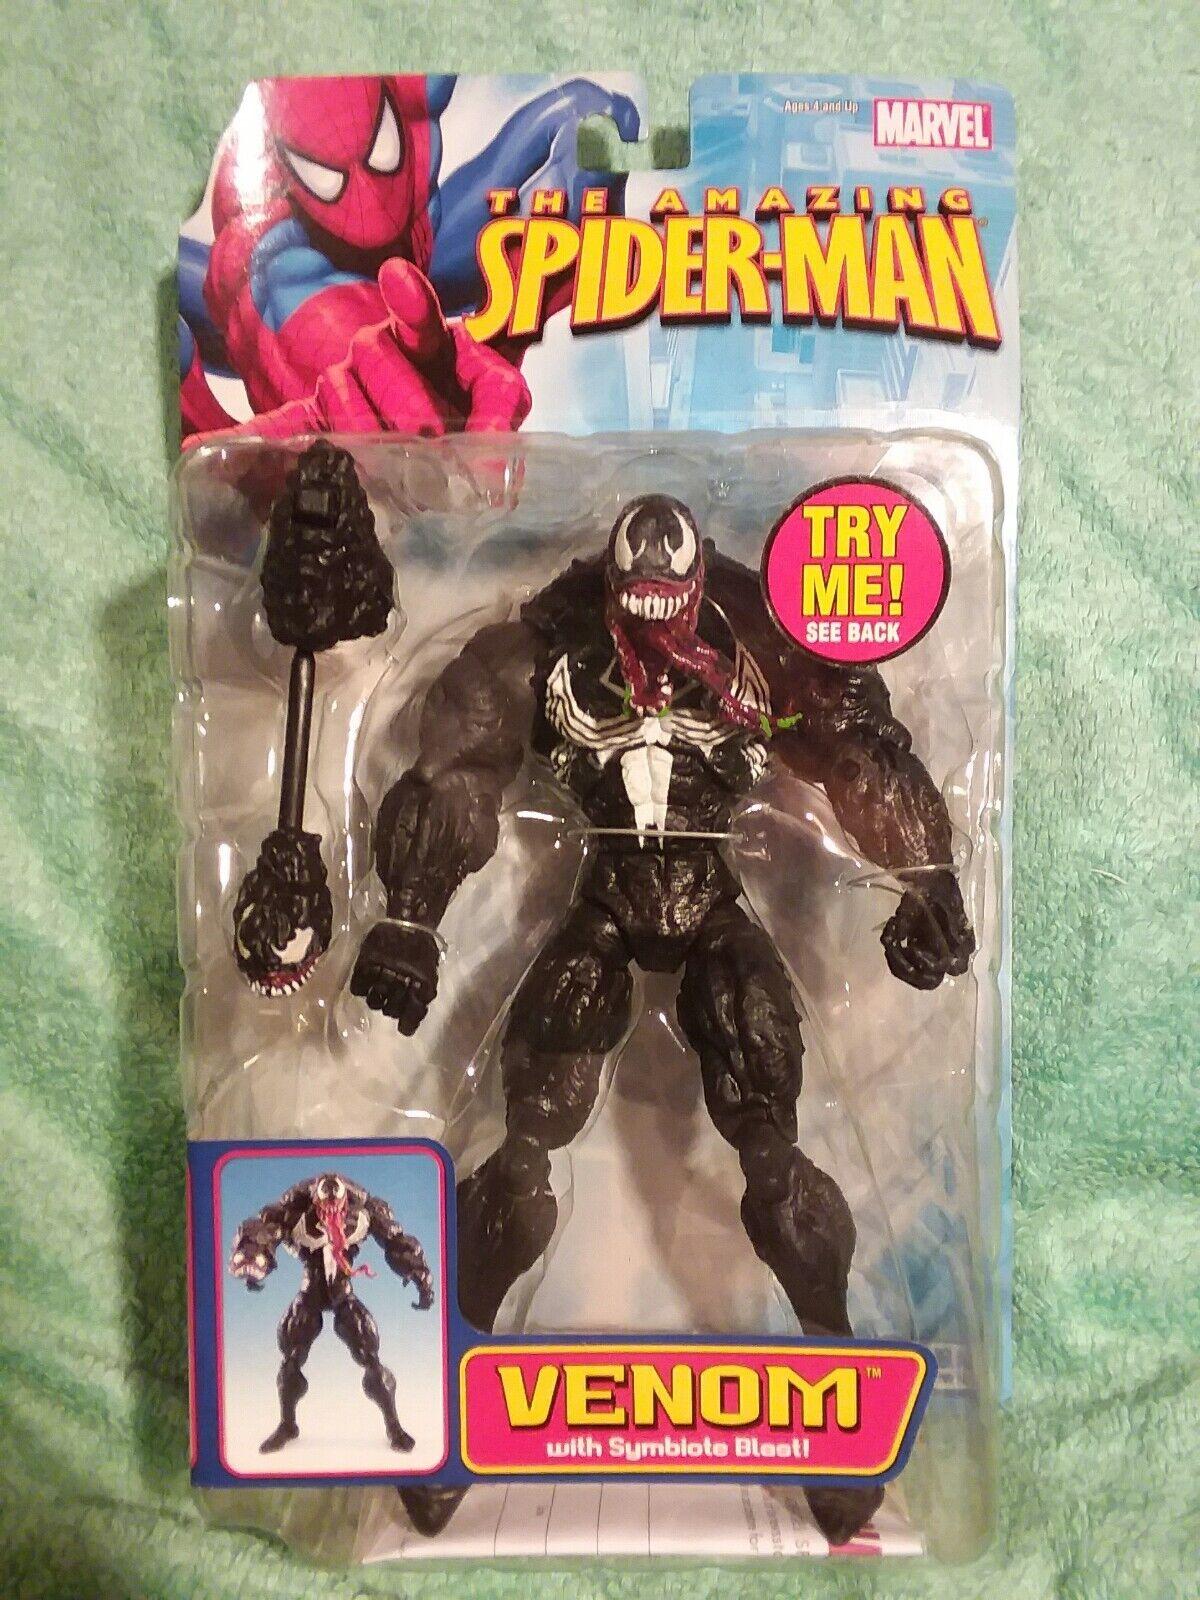 VENOM    Symbiote blast Marvel legends Amazing Spider Man 6 figure TOYBIZ 2006